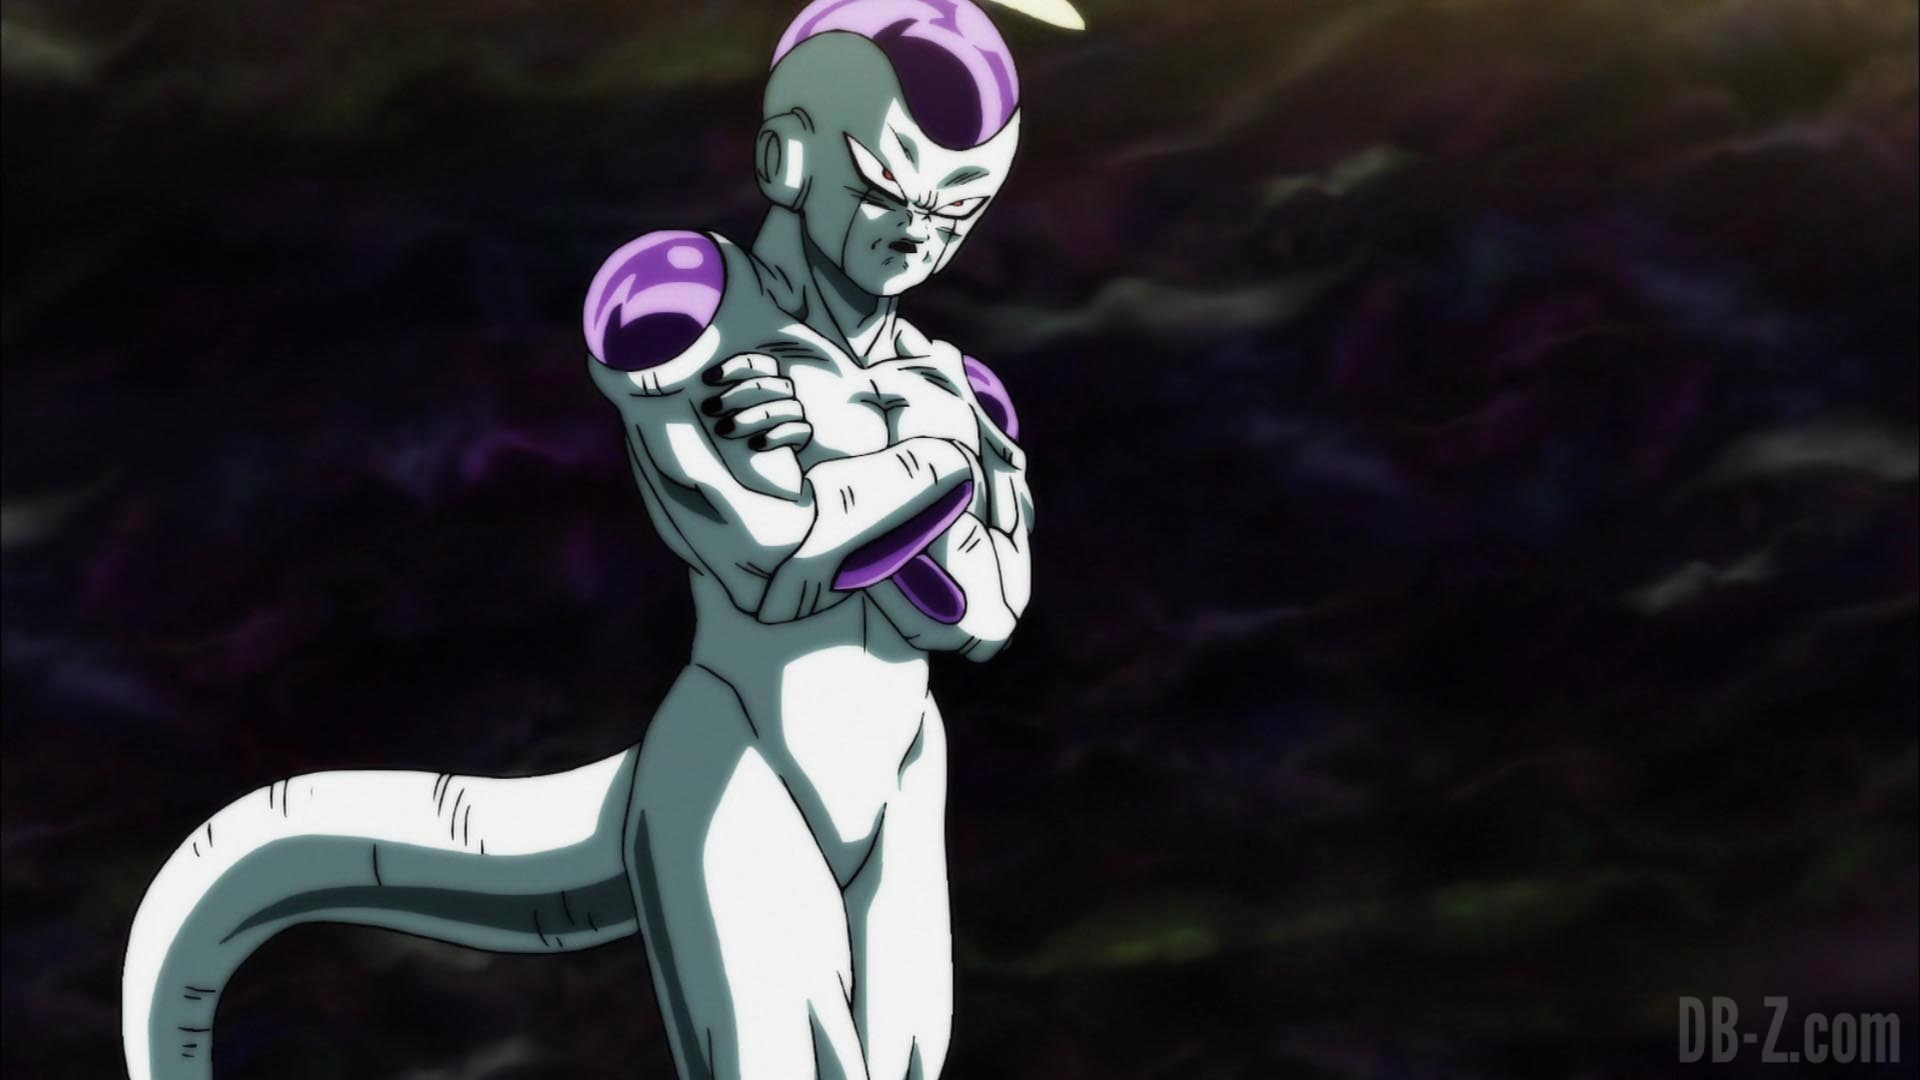 Dragon-Ball-Super-Episode-99-18.jpg